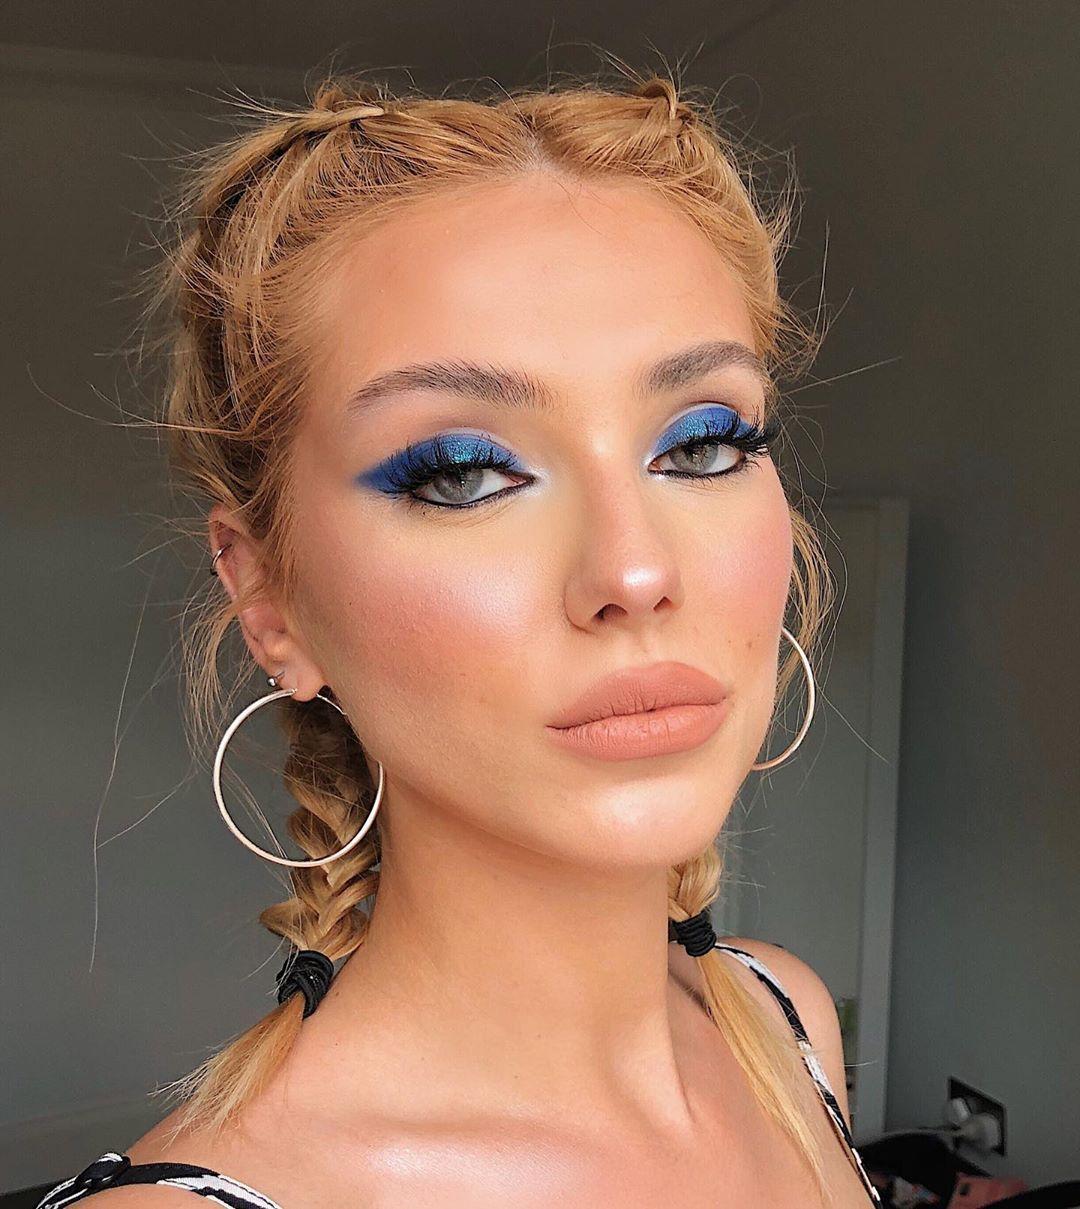 Blue metallic eyeshadow + wellmarked black pencil for a